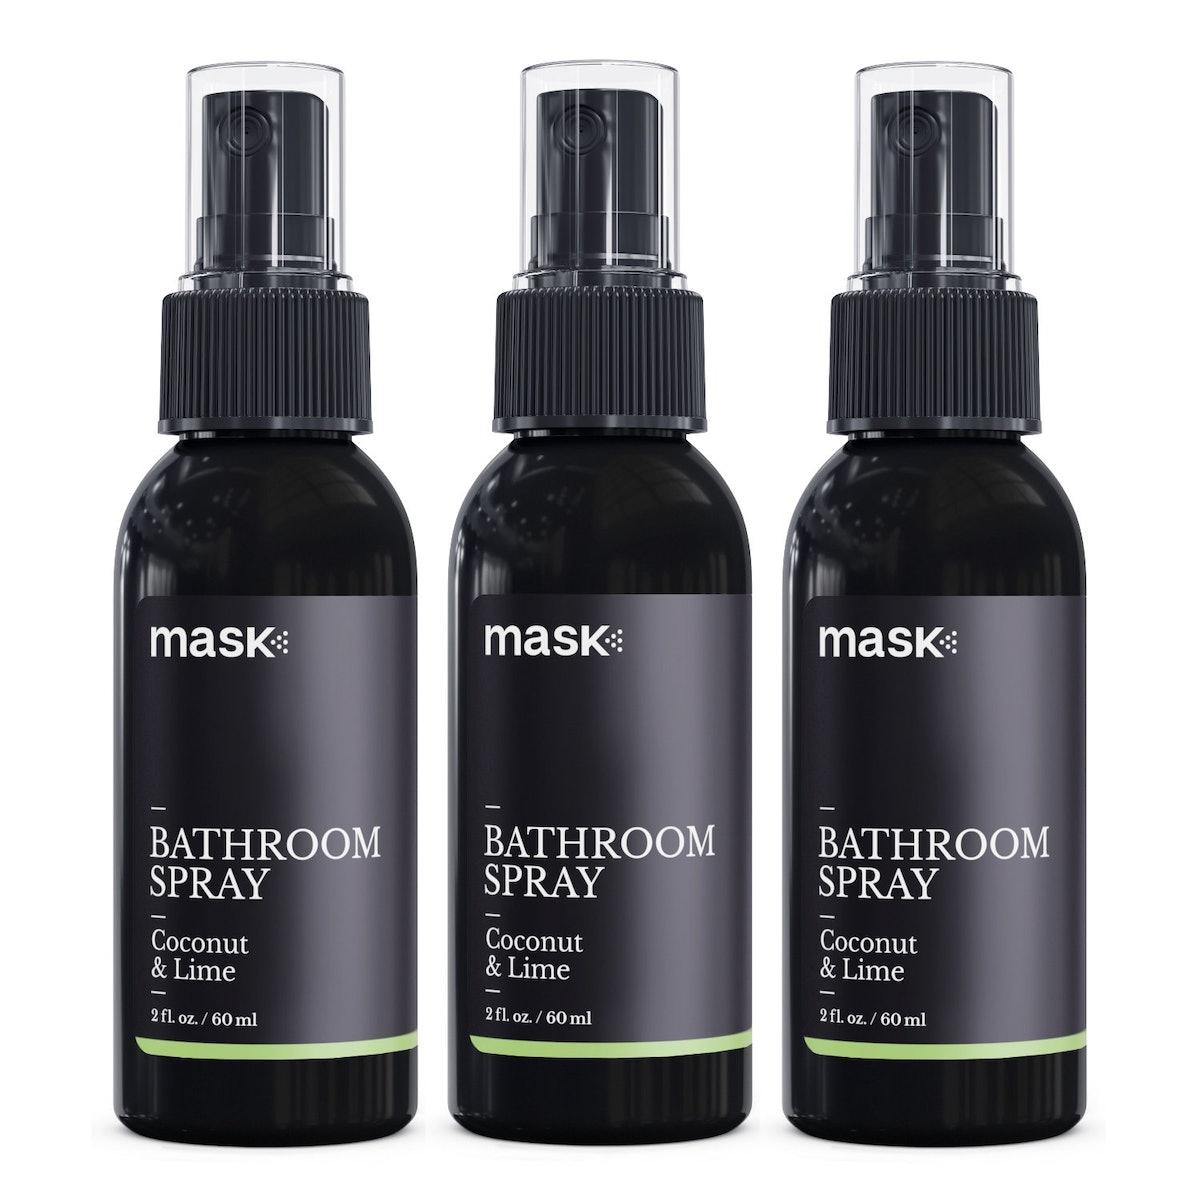 Mask Bathroom Spray